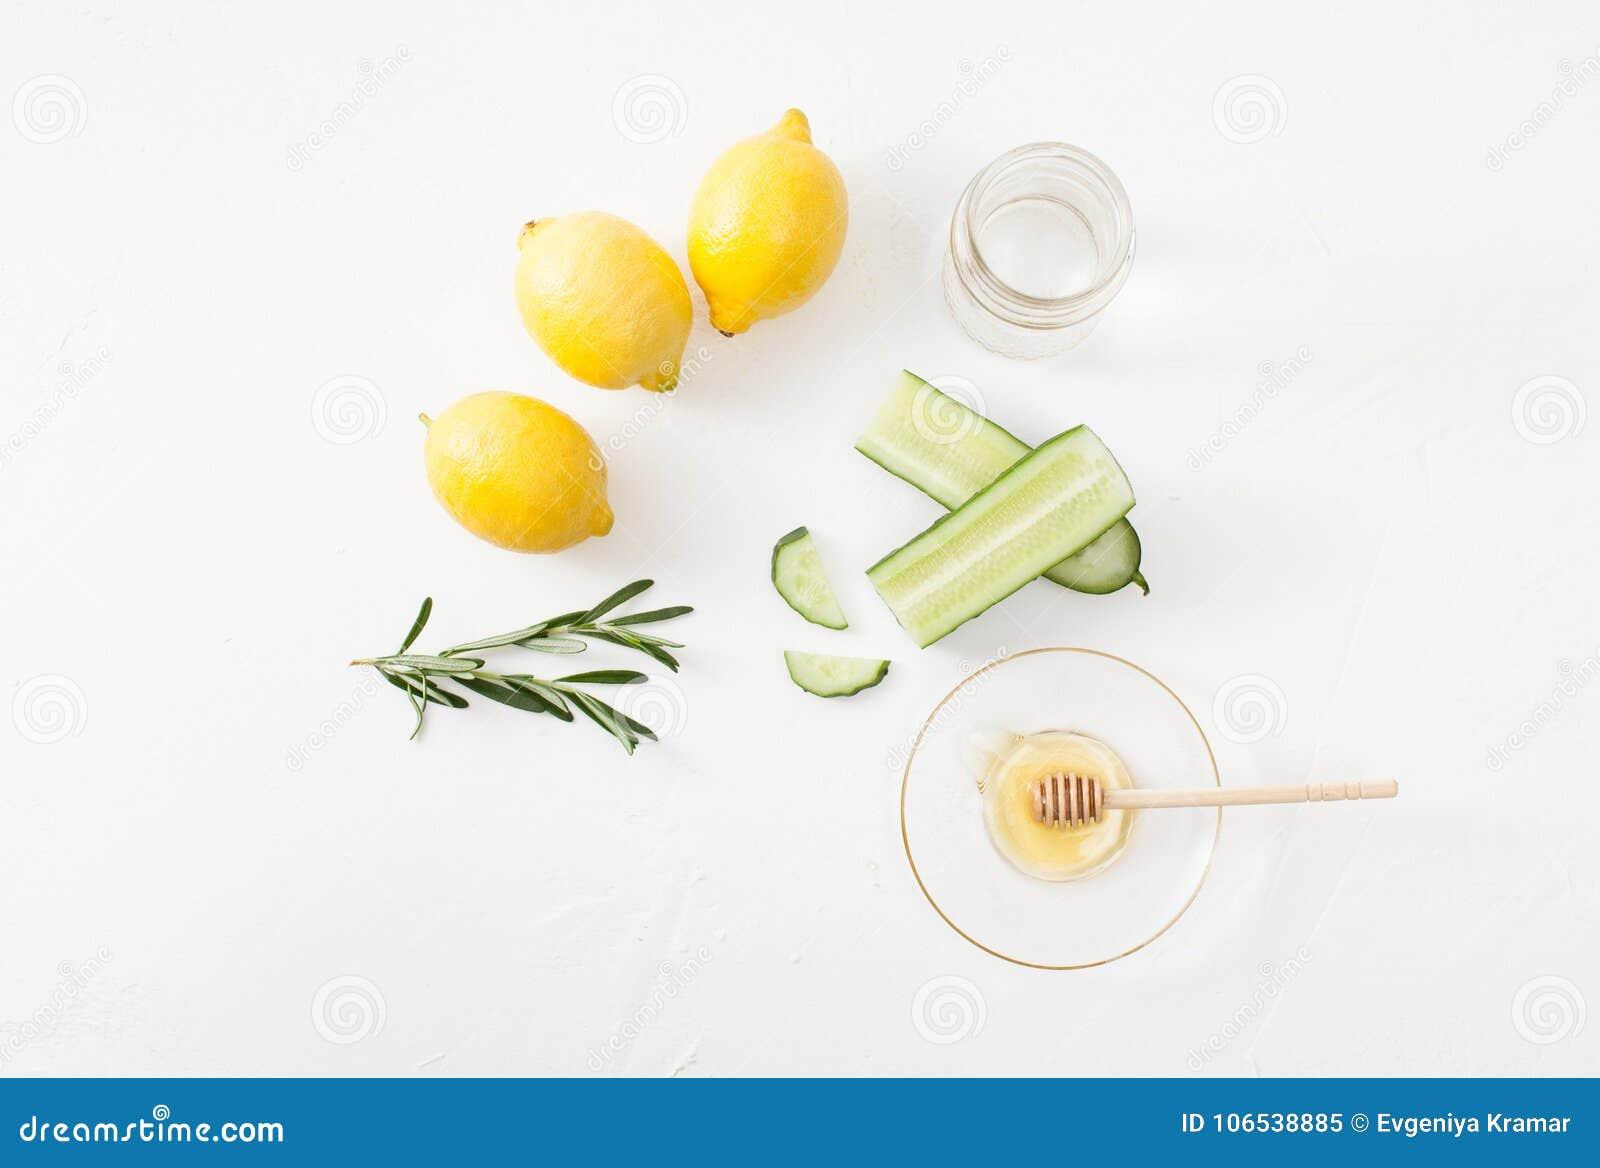 Pepino, mel e alecrins e limões cortados no fundo branco